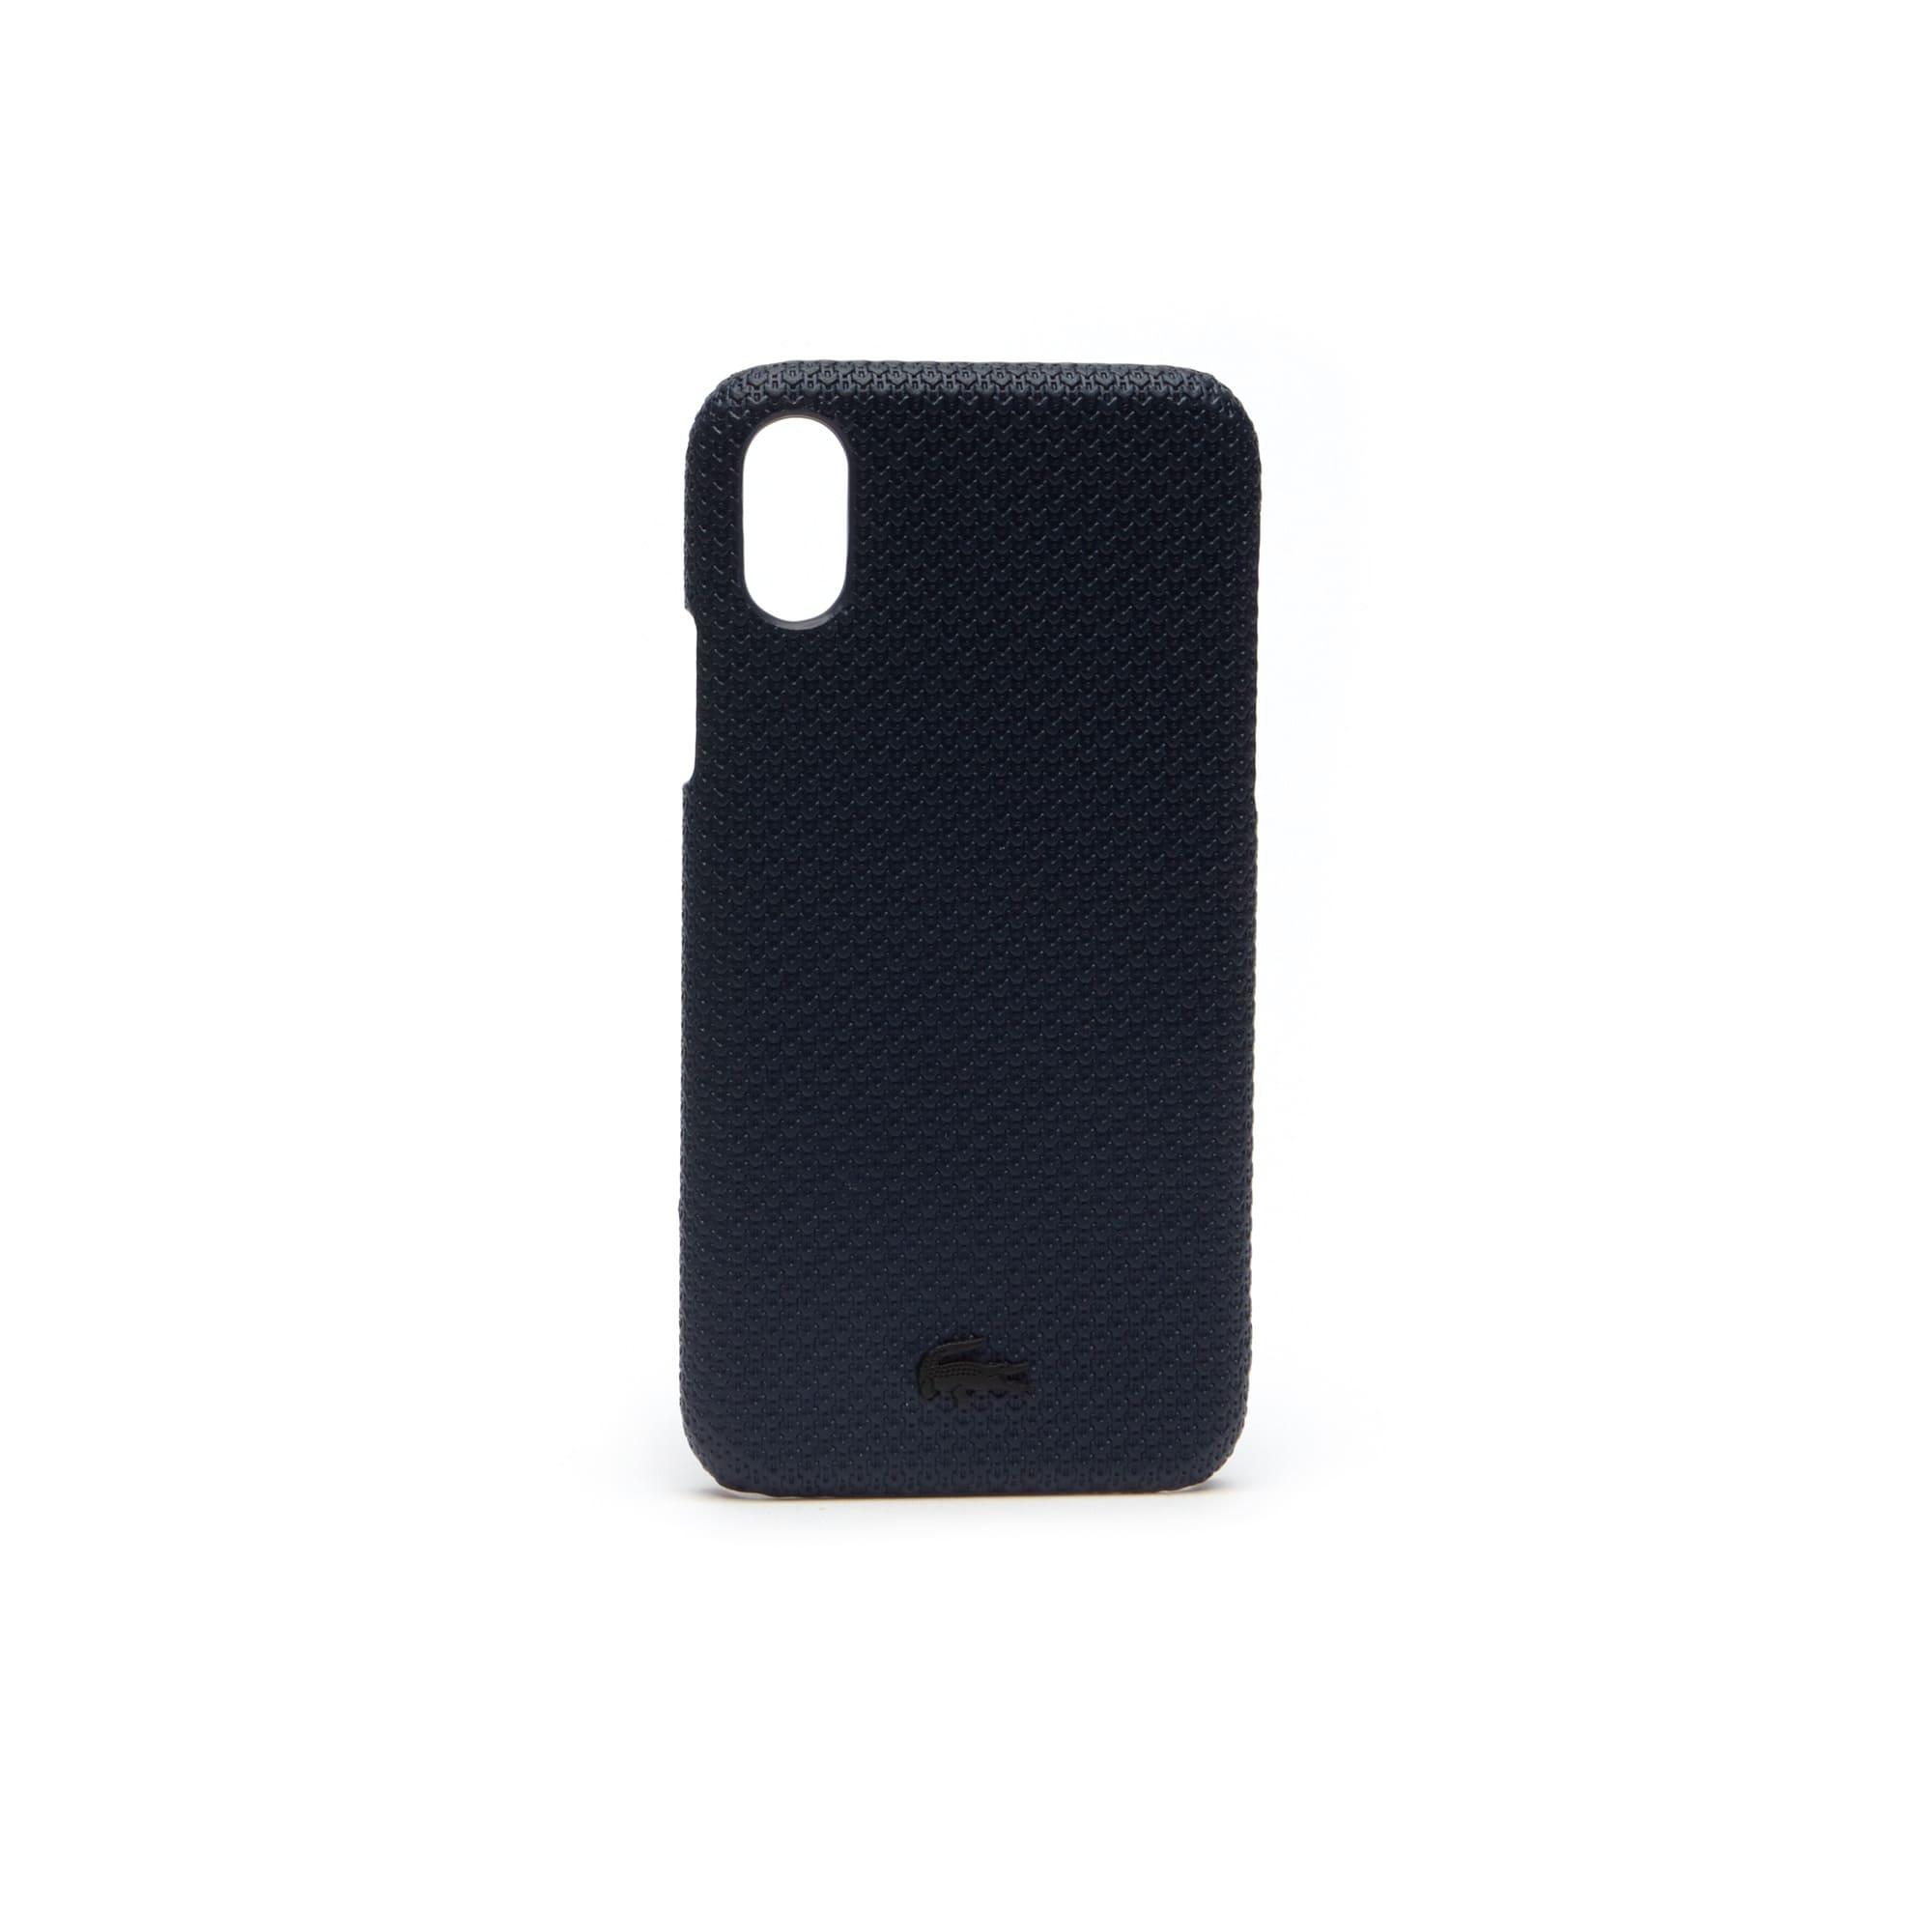 Herren CHANTACO iPhone X Hülle aus Piqué-Leder